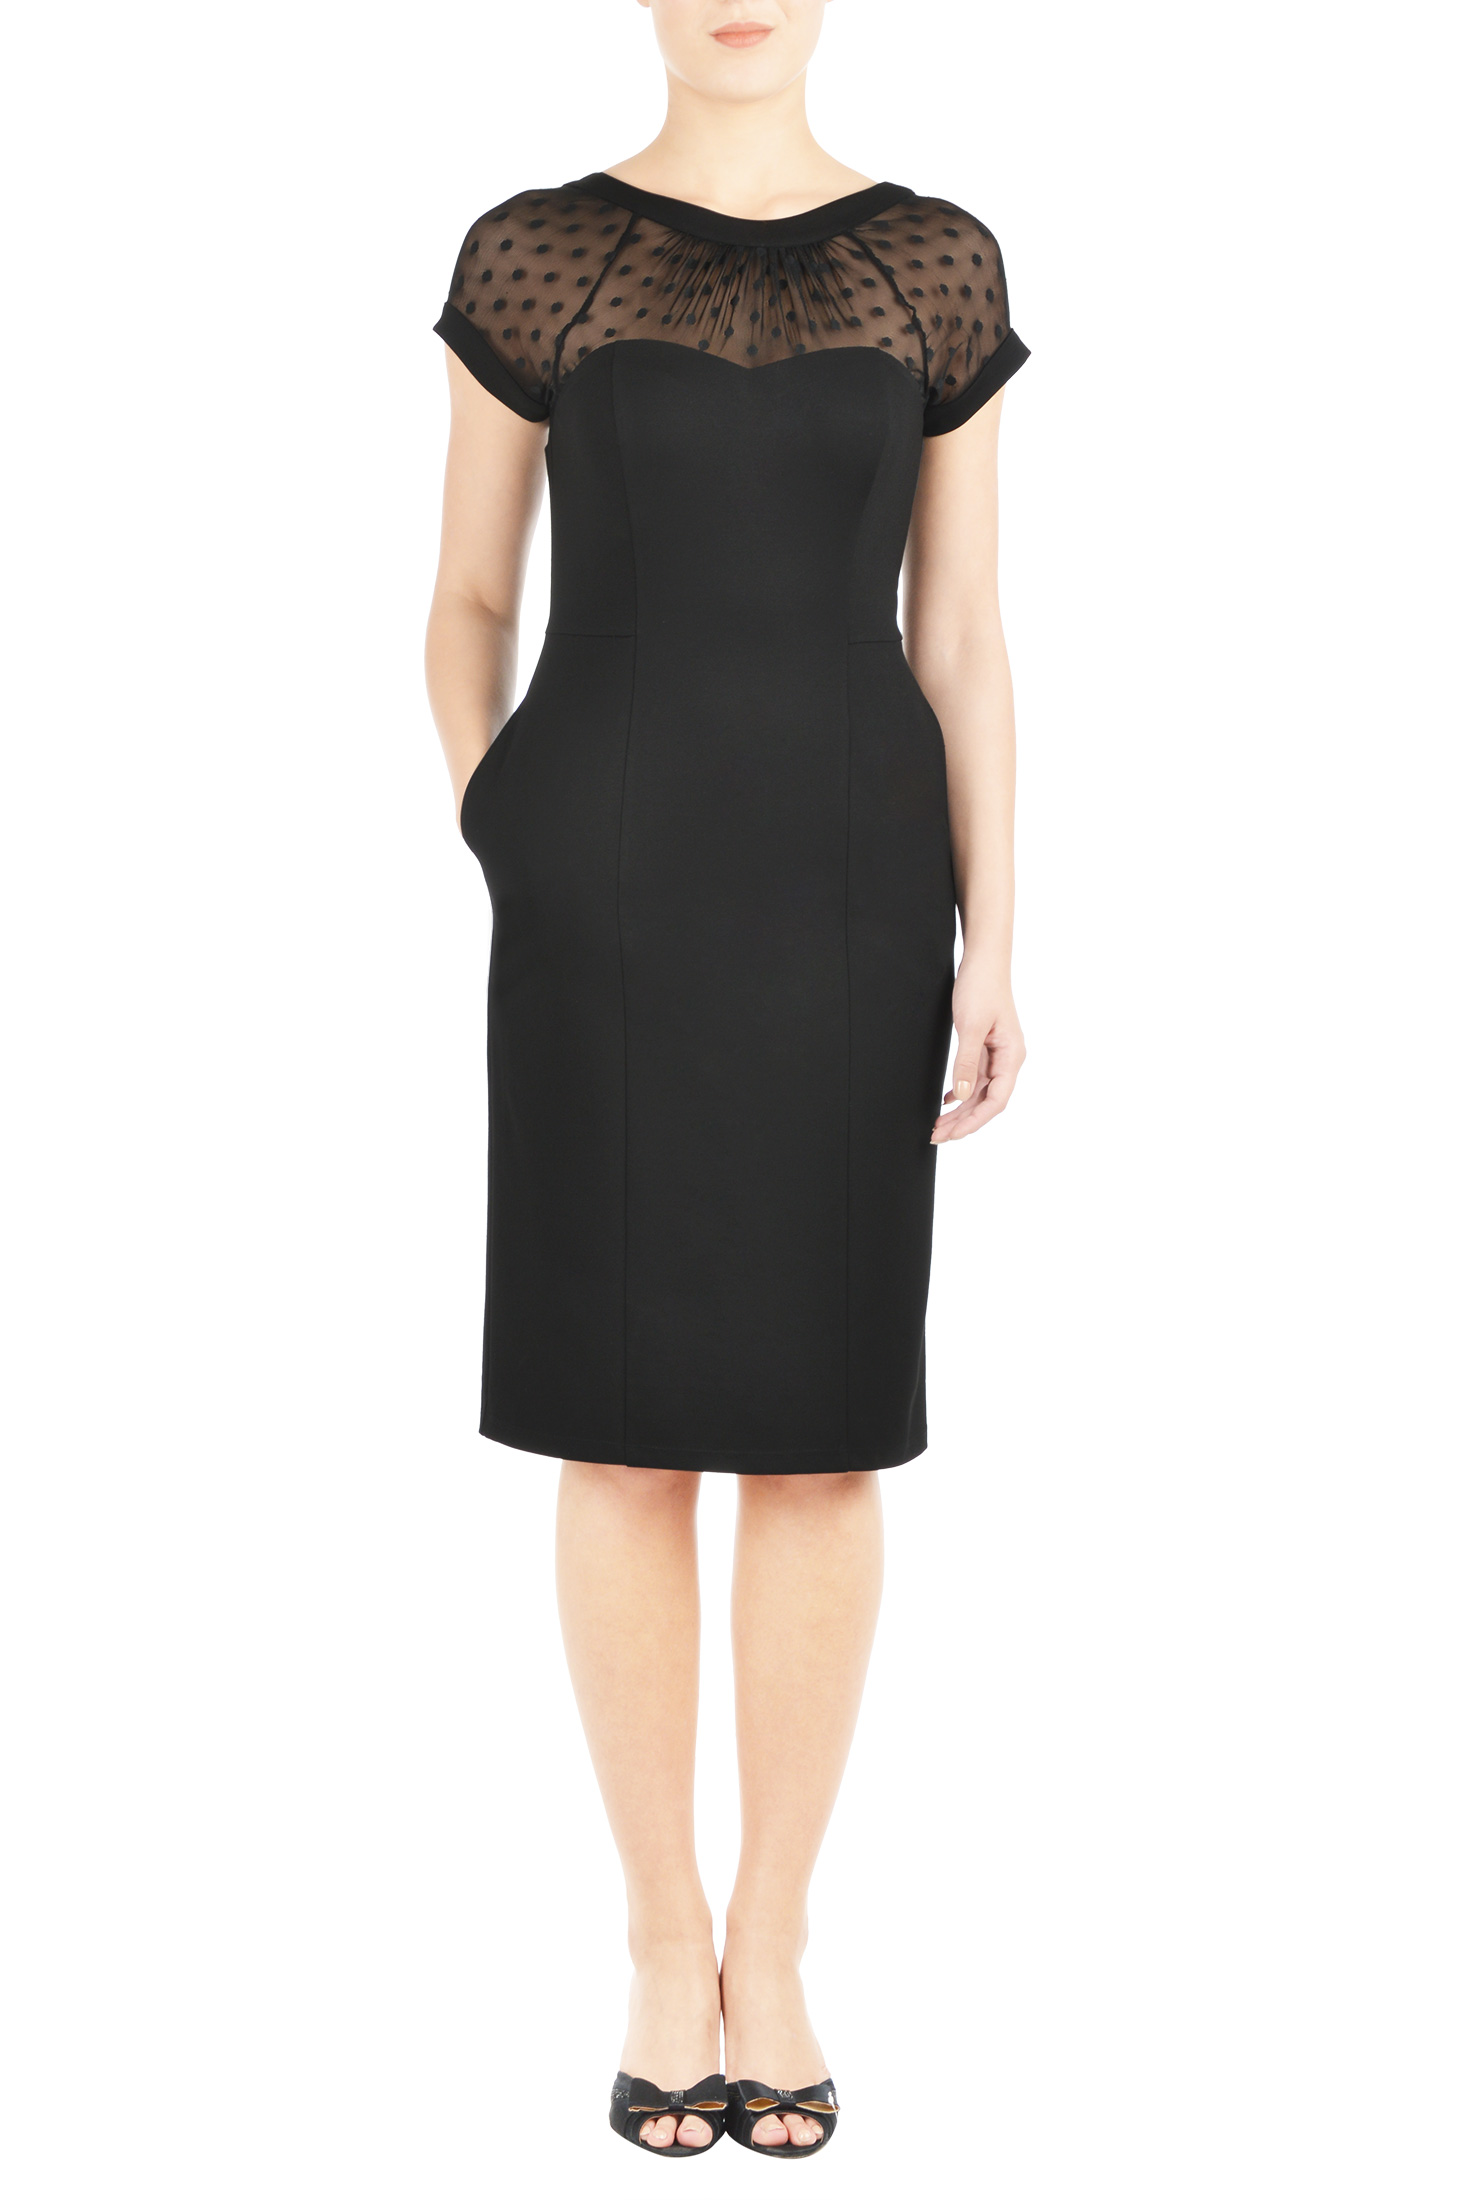 Women s Fashion Clothing 0-36W and Custom 554480558